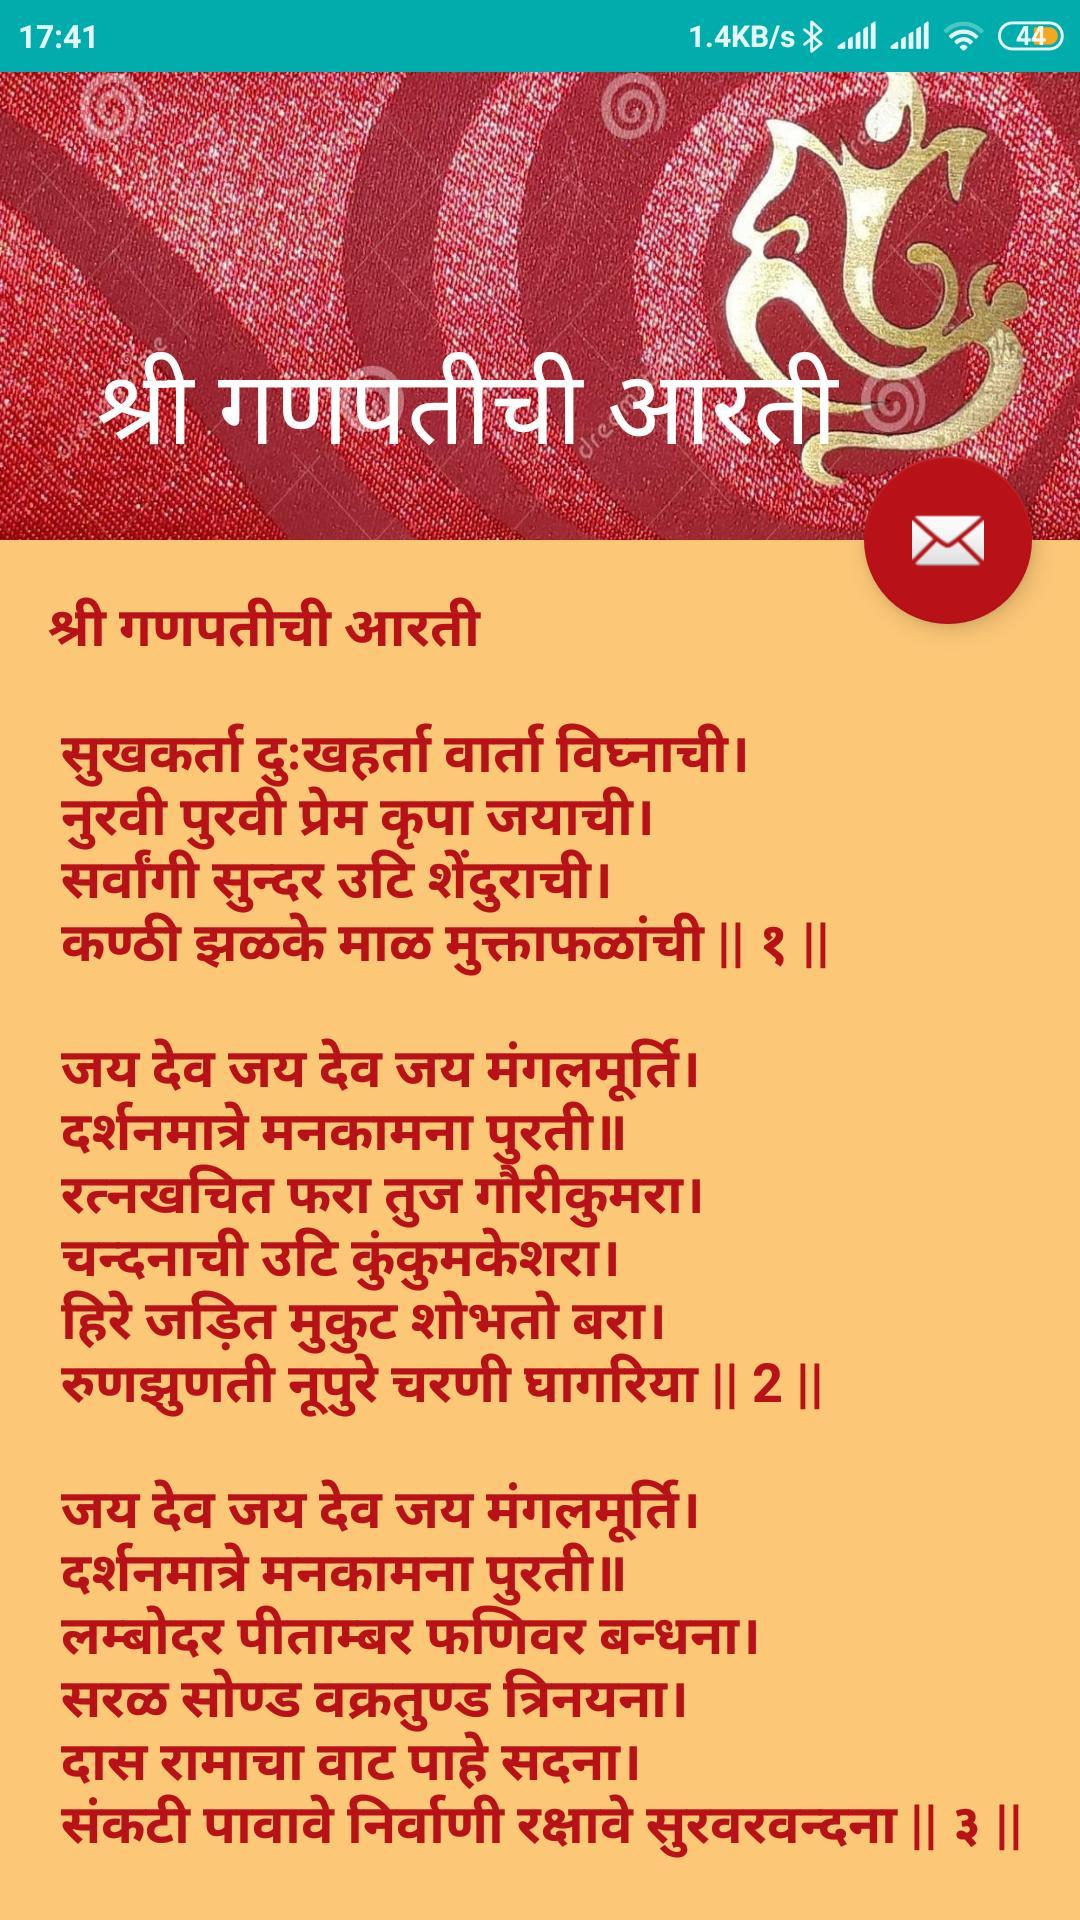 Shri Ganpati Aarti Marathi for Android - APK Download